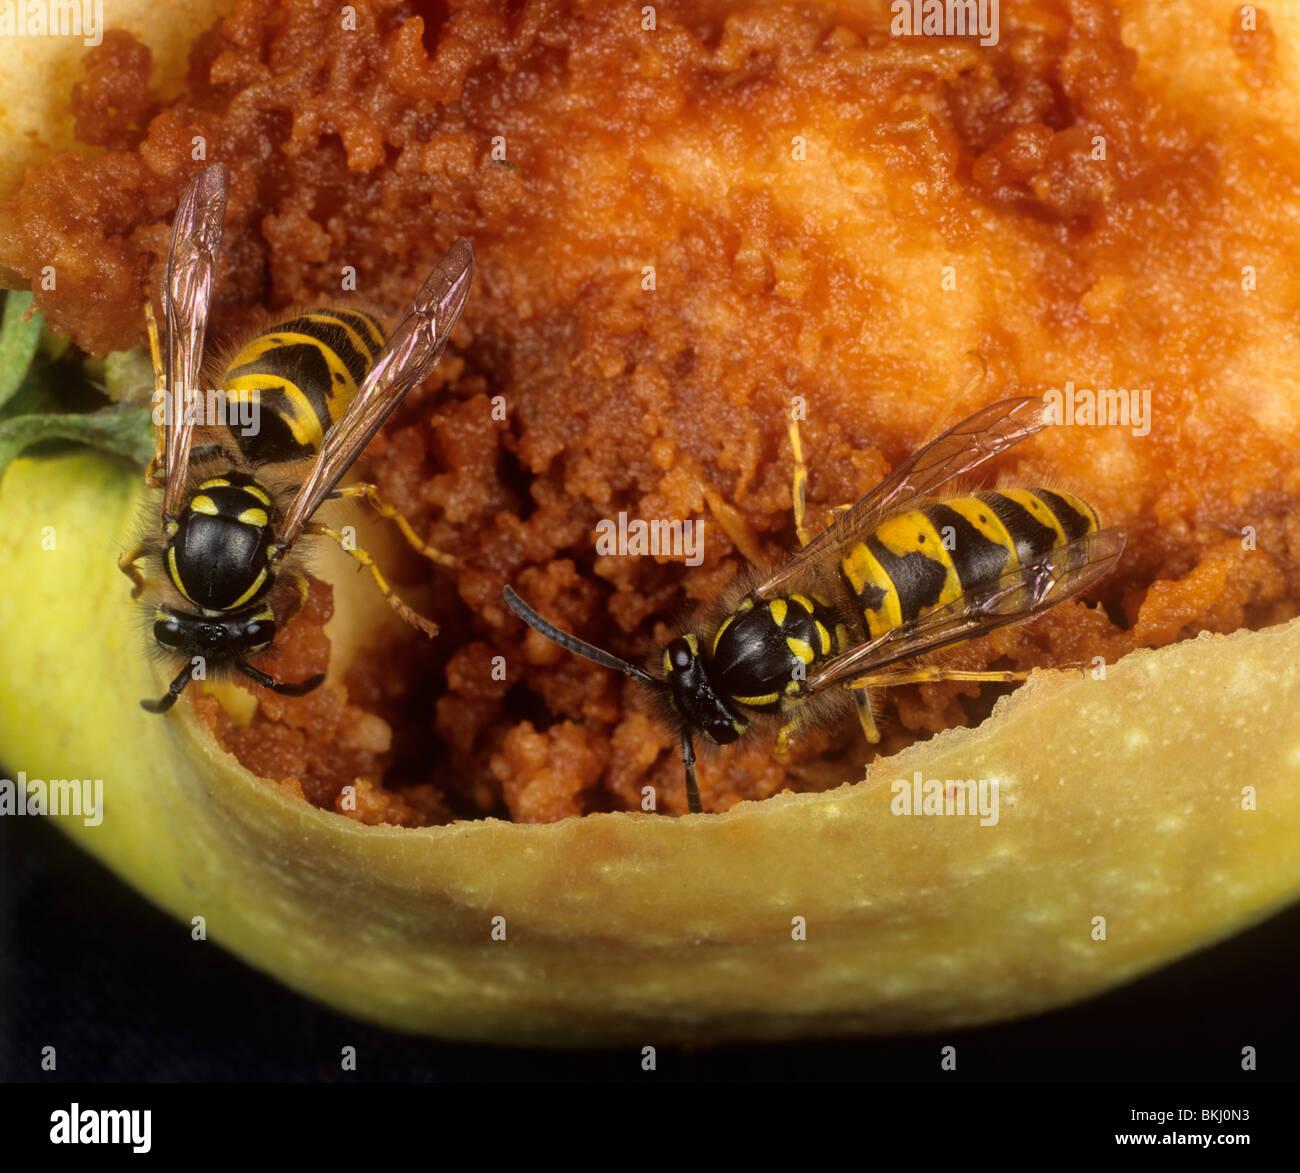 Common wasp (Vespula vulgaris) adults feeding on a damaged apple fruit - Stock Image